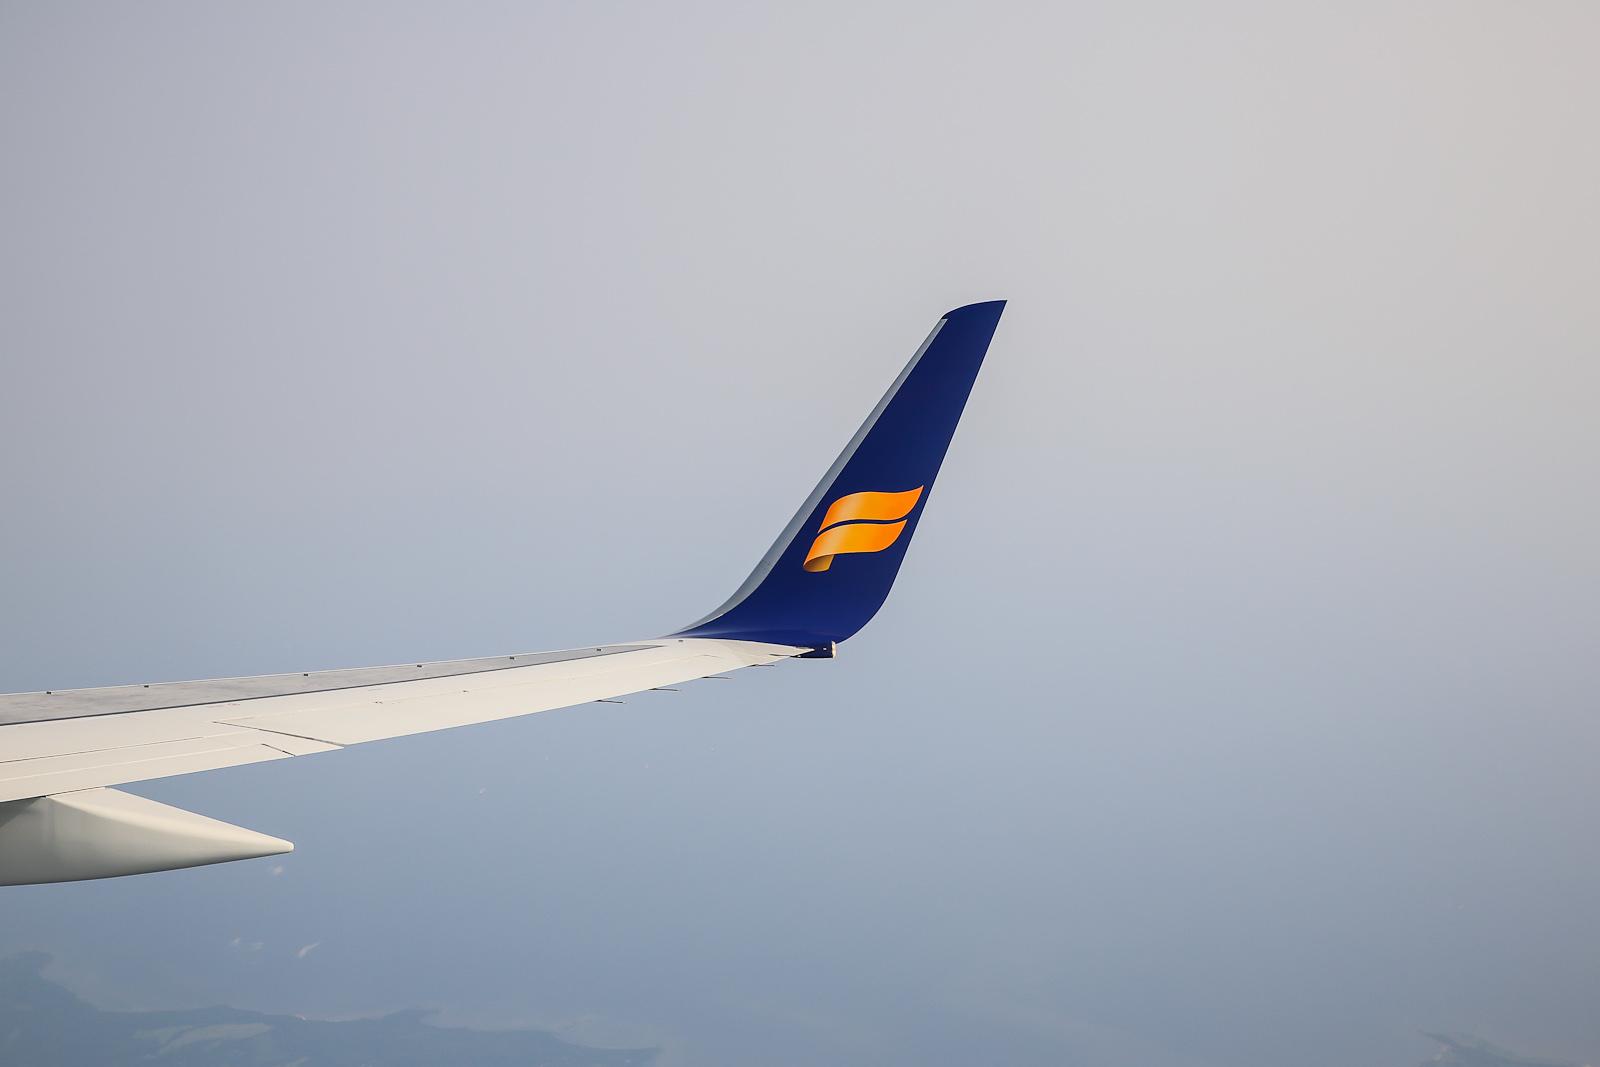 Авиакомпания Боинг-757-200 авиакомпании Icelandair